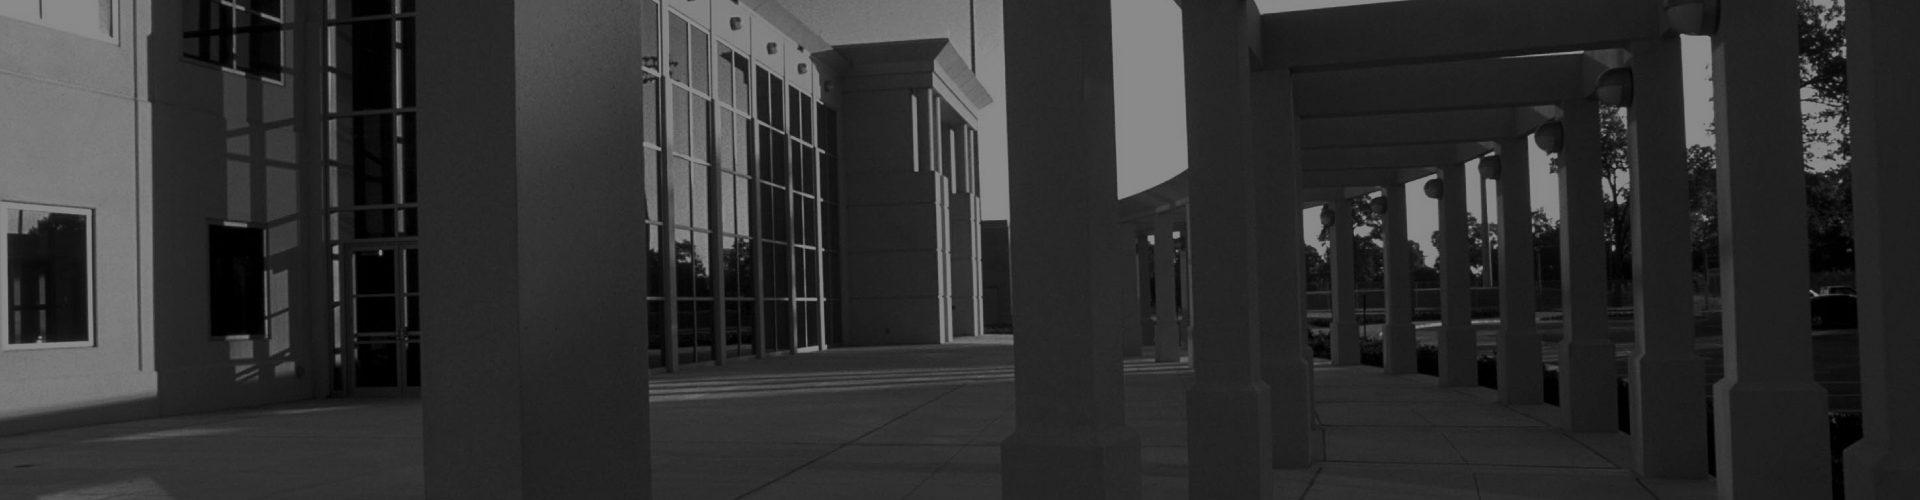 Black and White Photo of University of Houston Campus